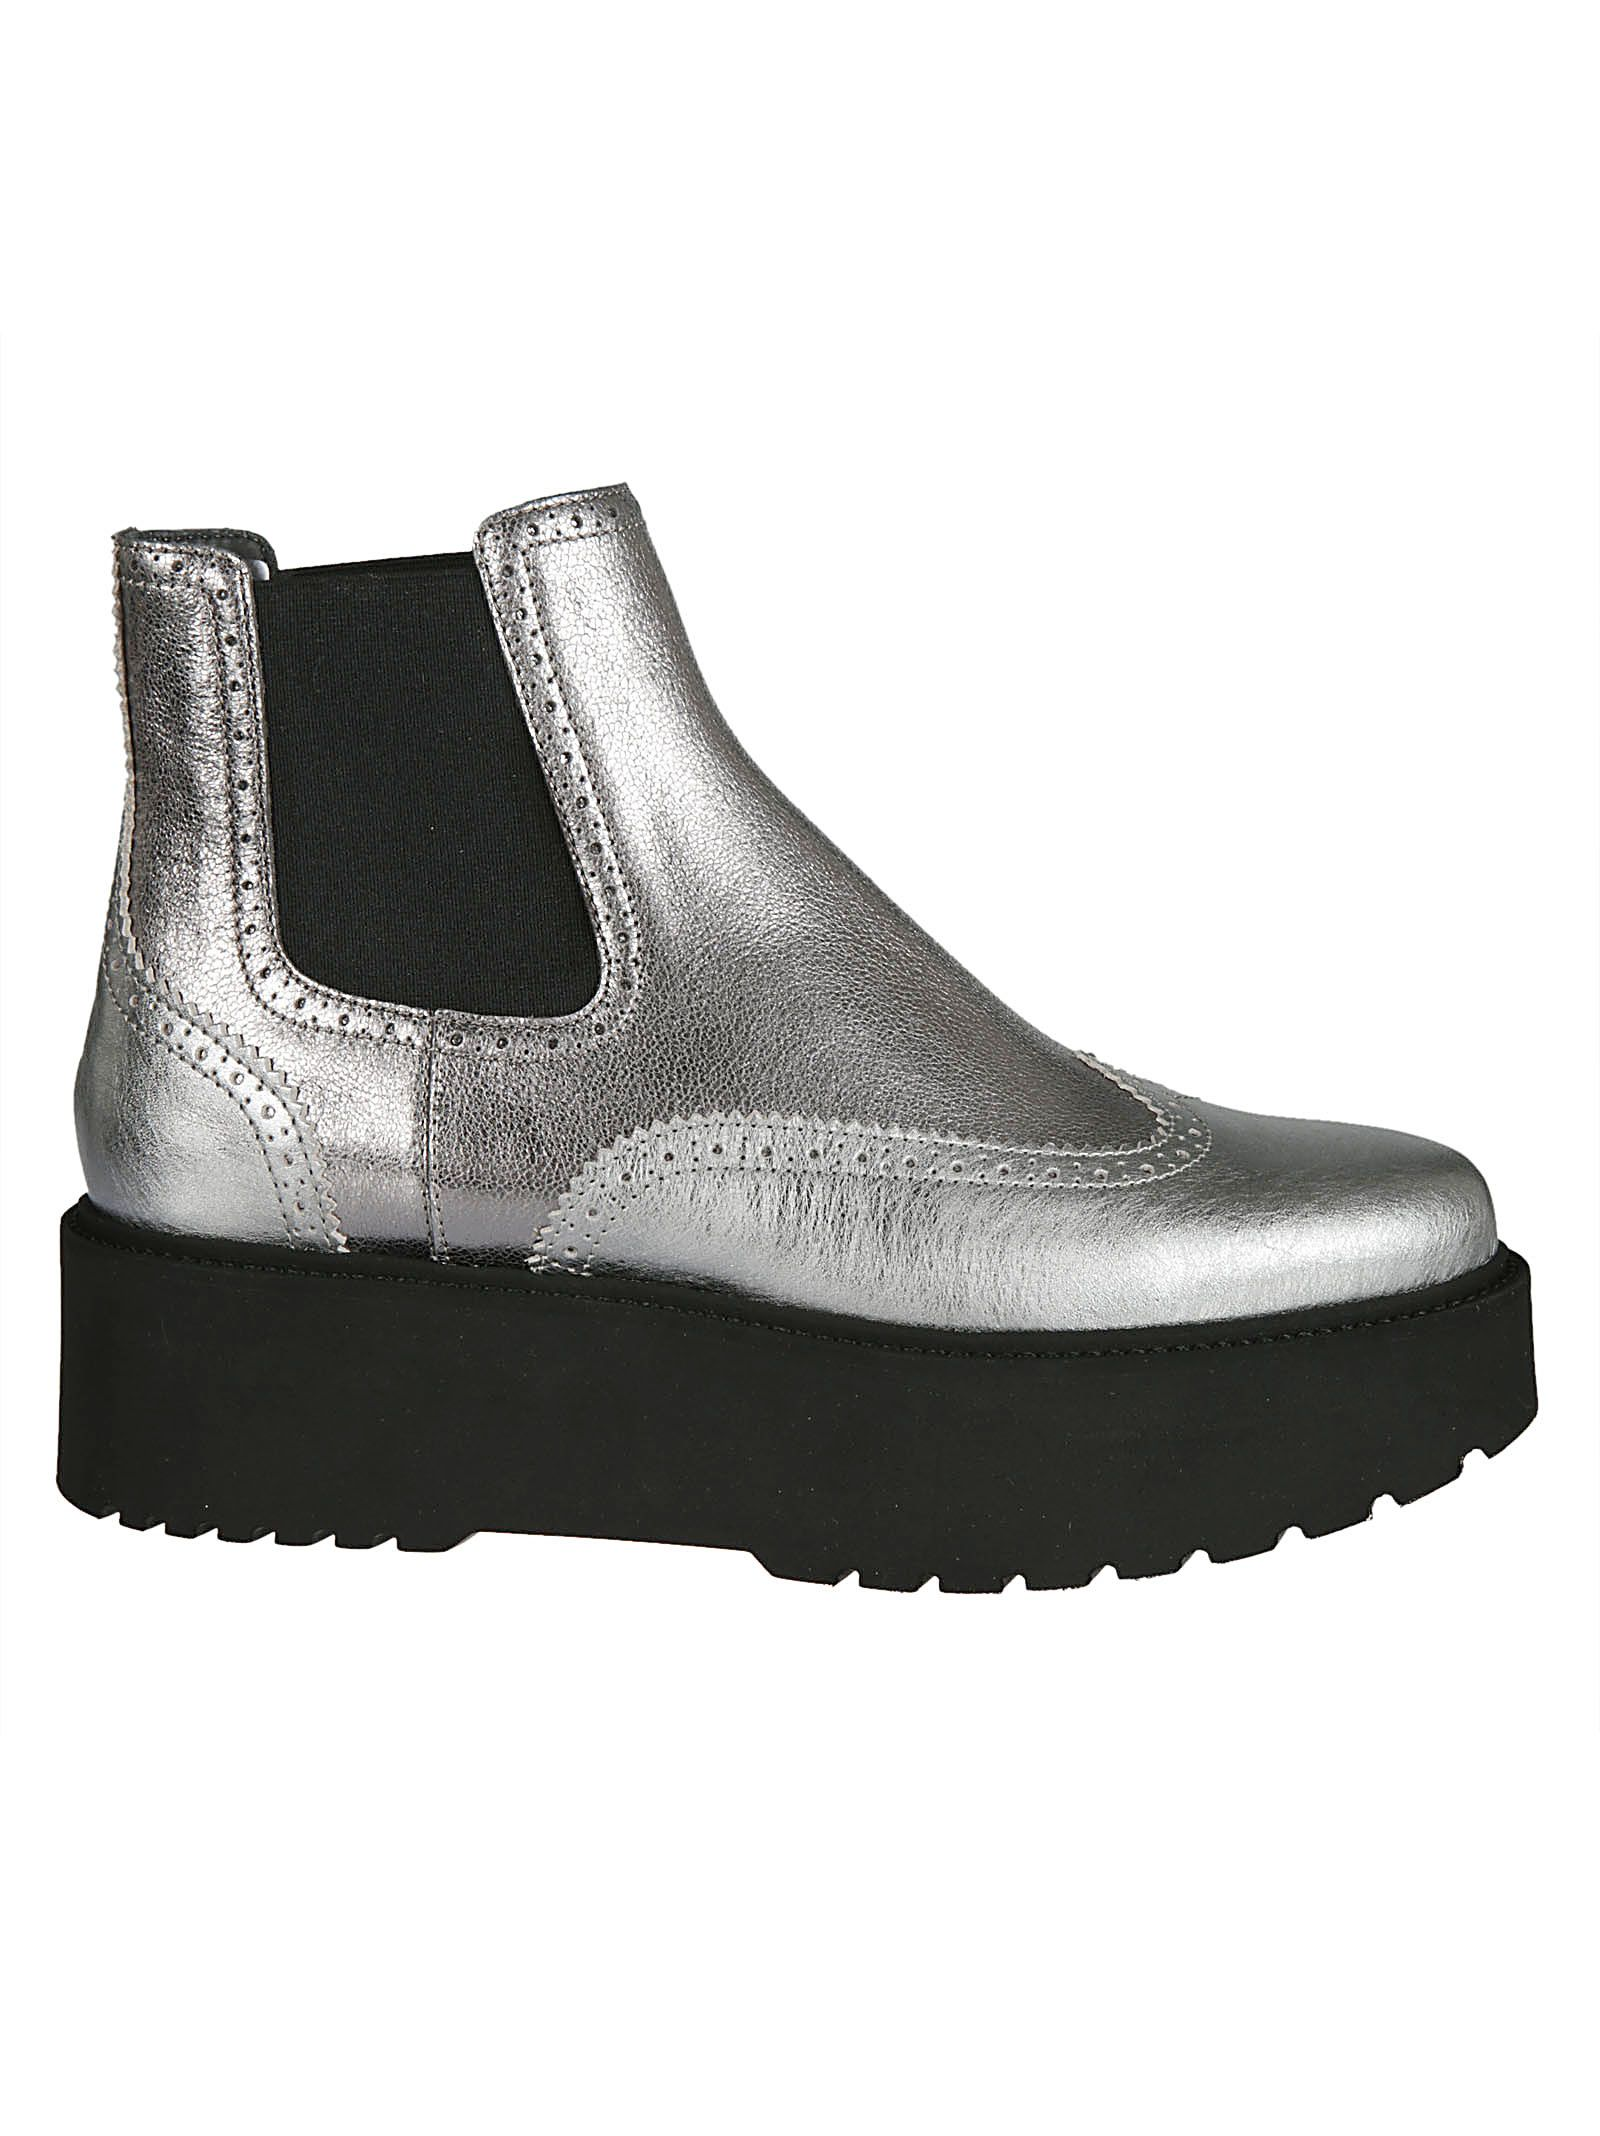 hogan -  High-cut Slip-on Monk Shoes